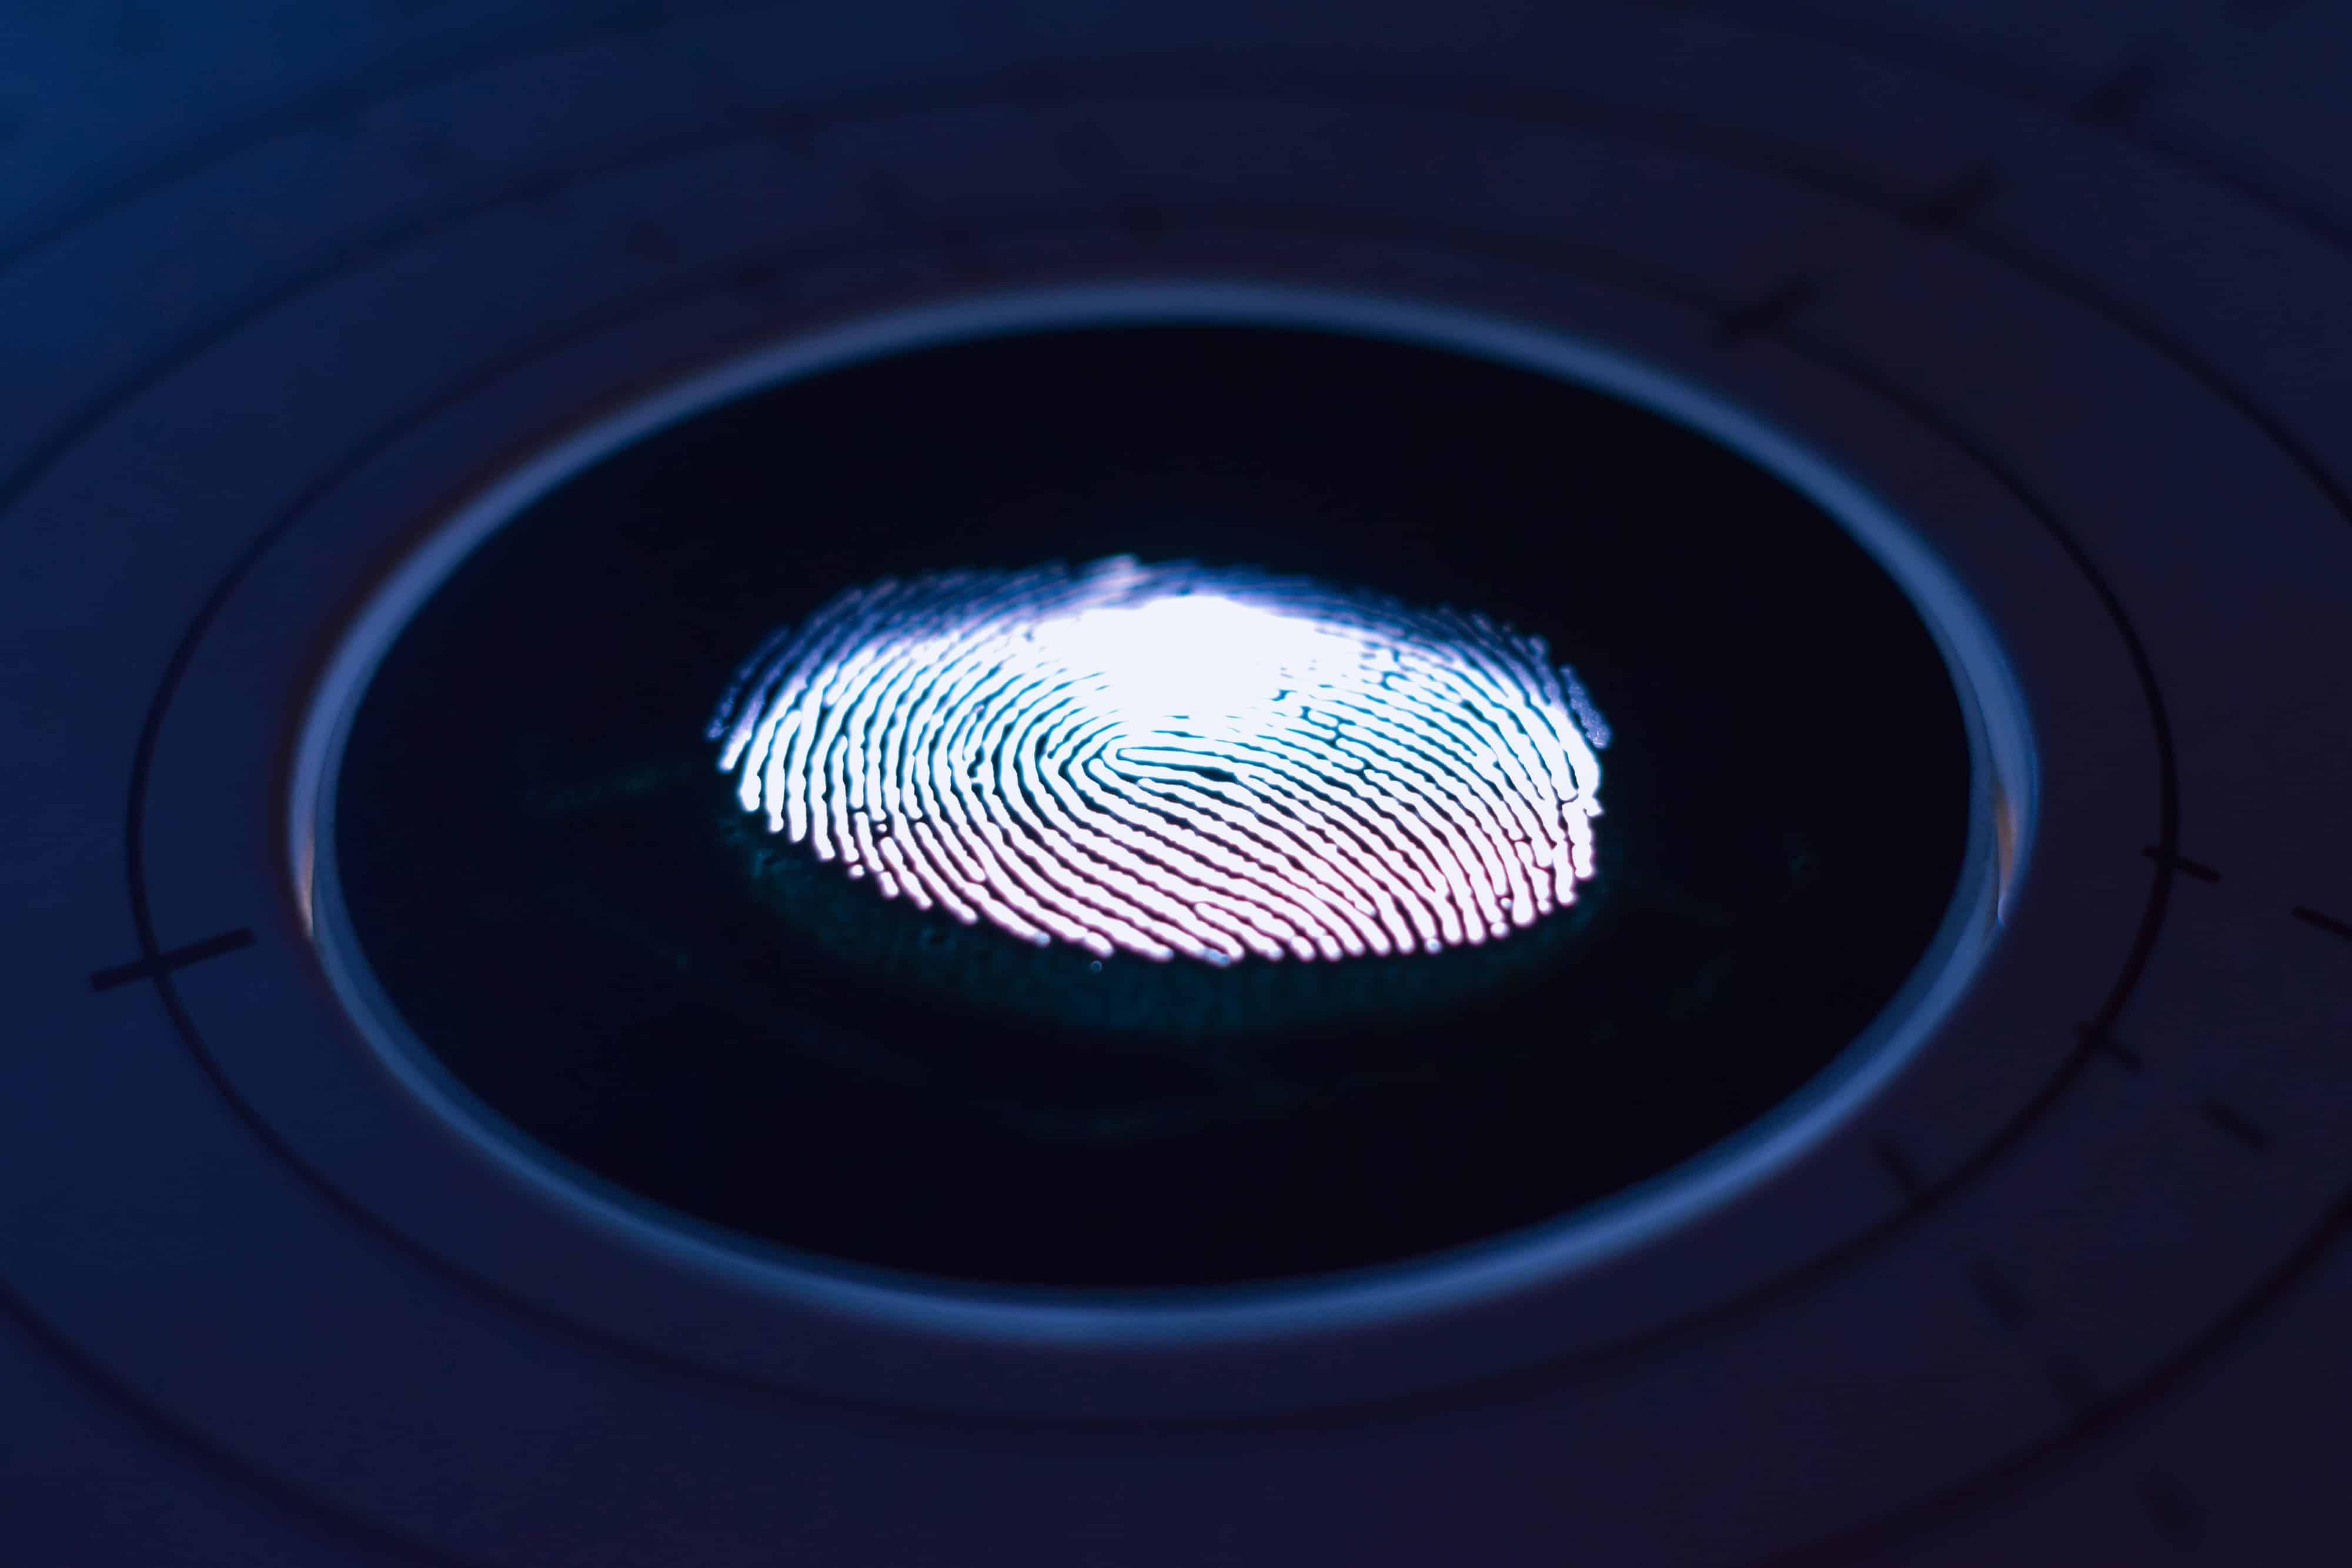 iPhone fingerprint sensor